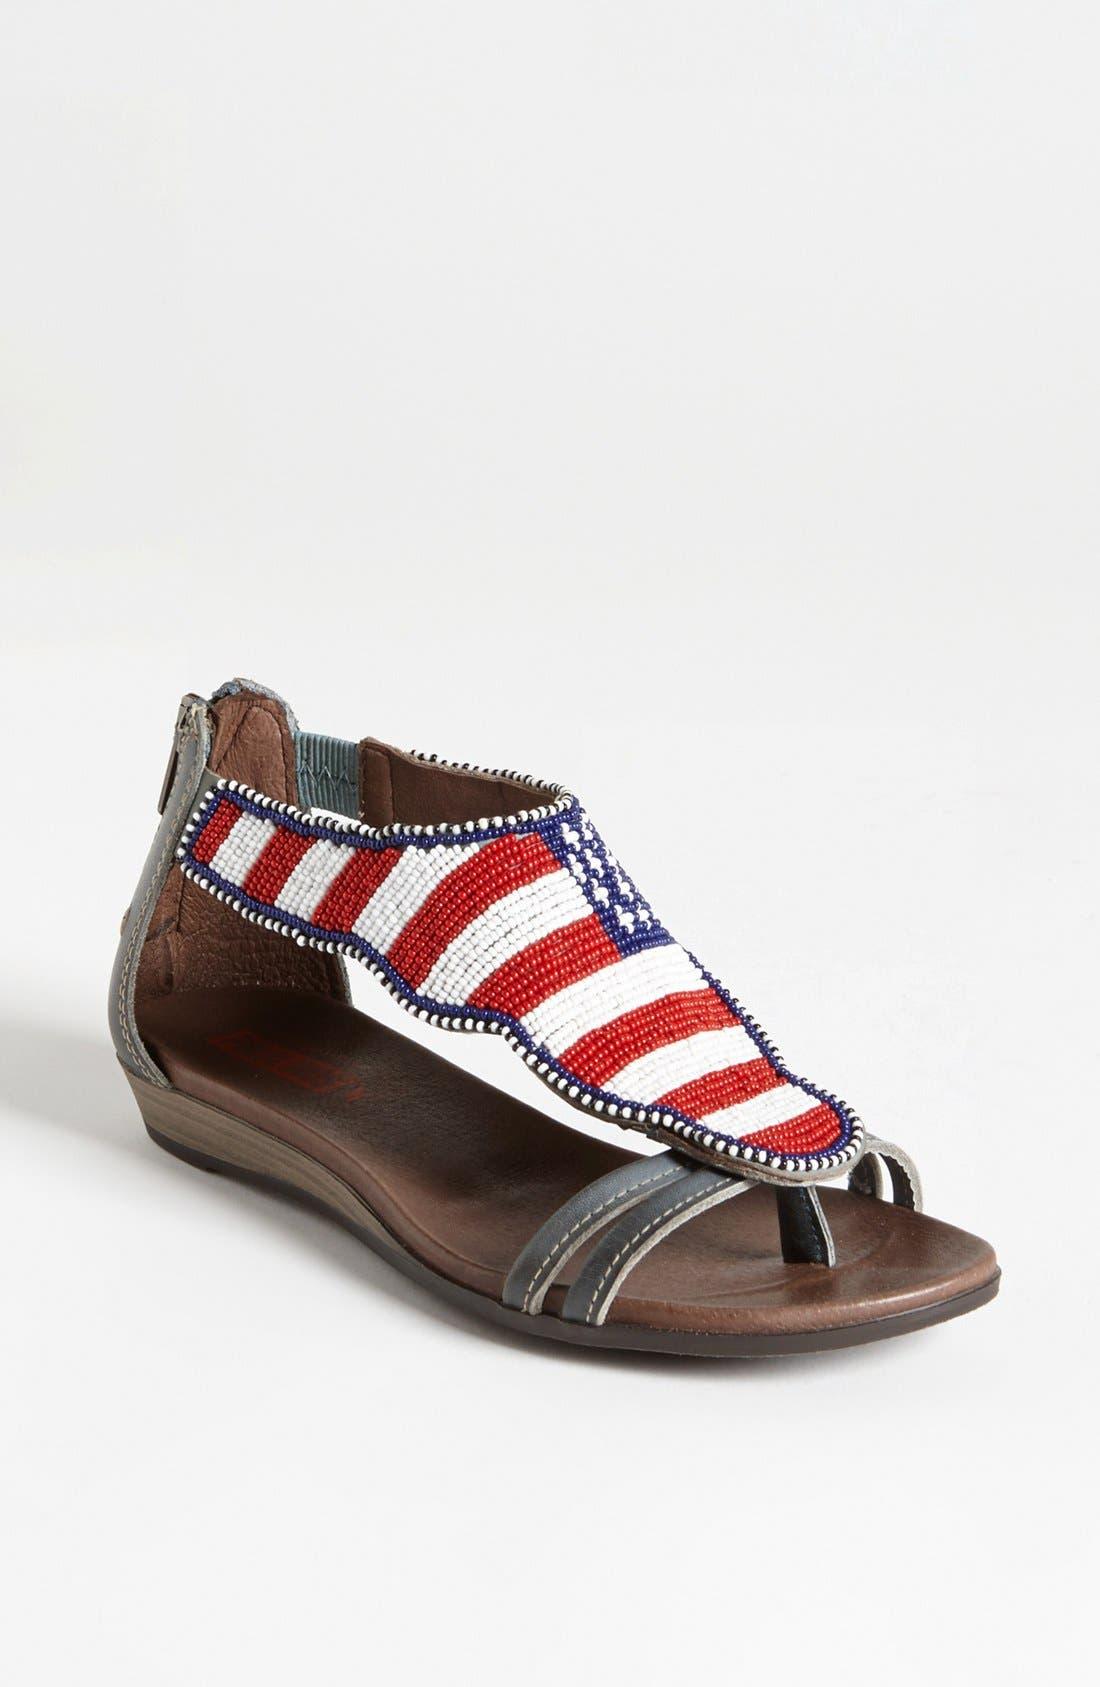 Main Image - PIKOLINOS 'Alcudia Maasai - USA' Sandal